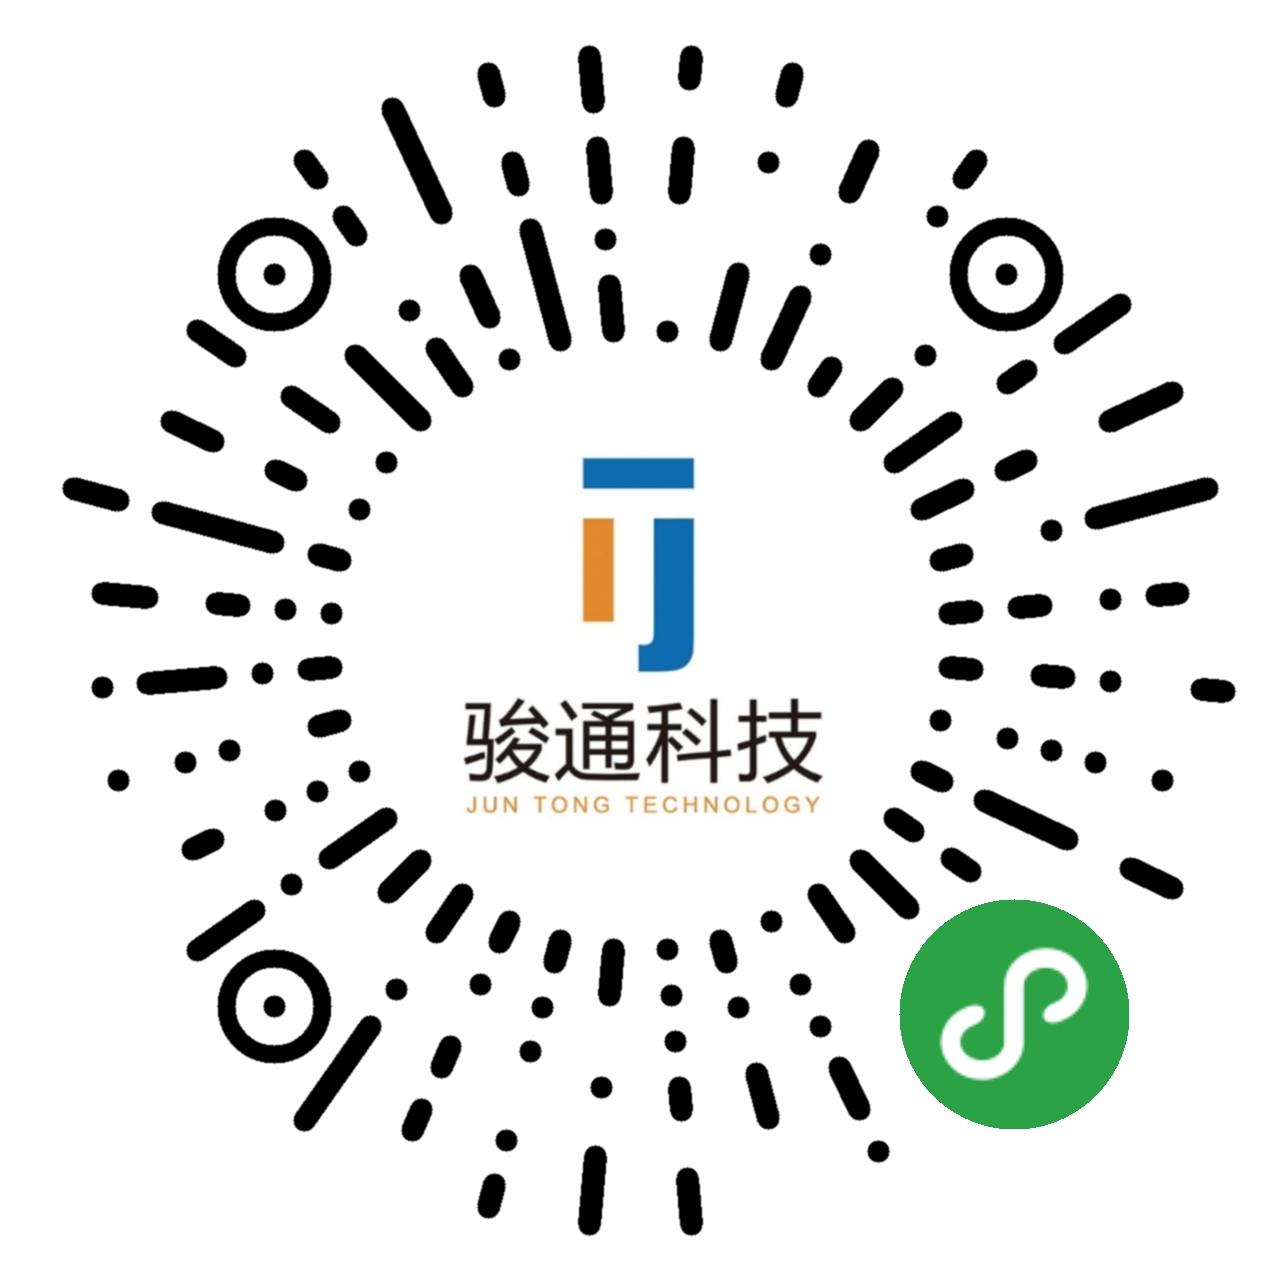 jt 0首付以租代购官方小程序